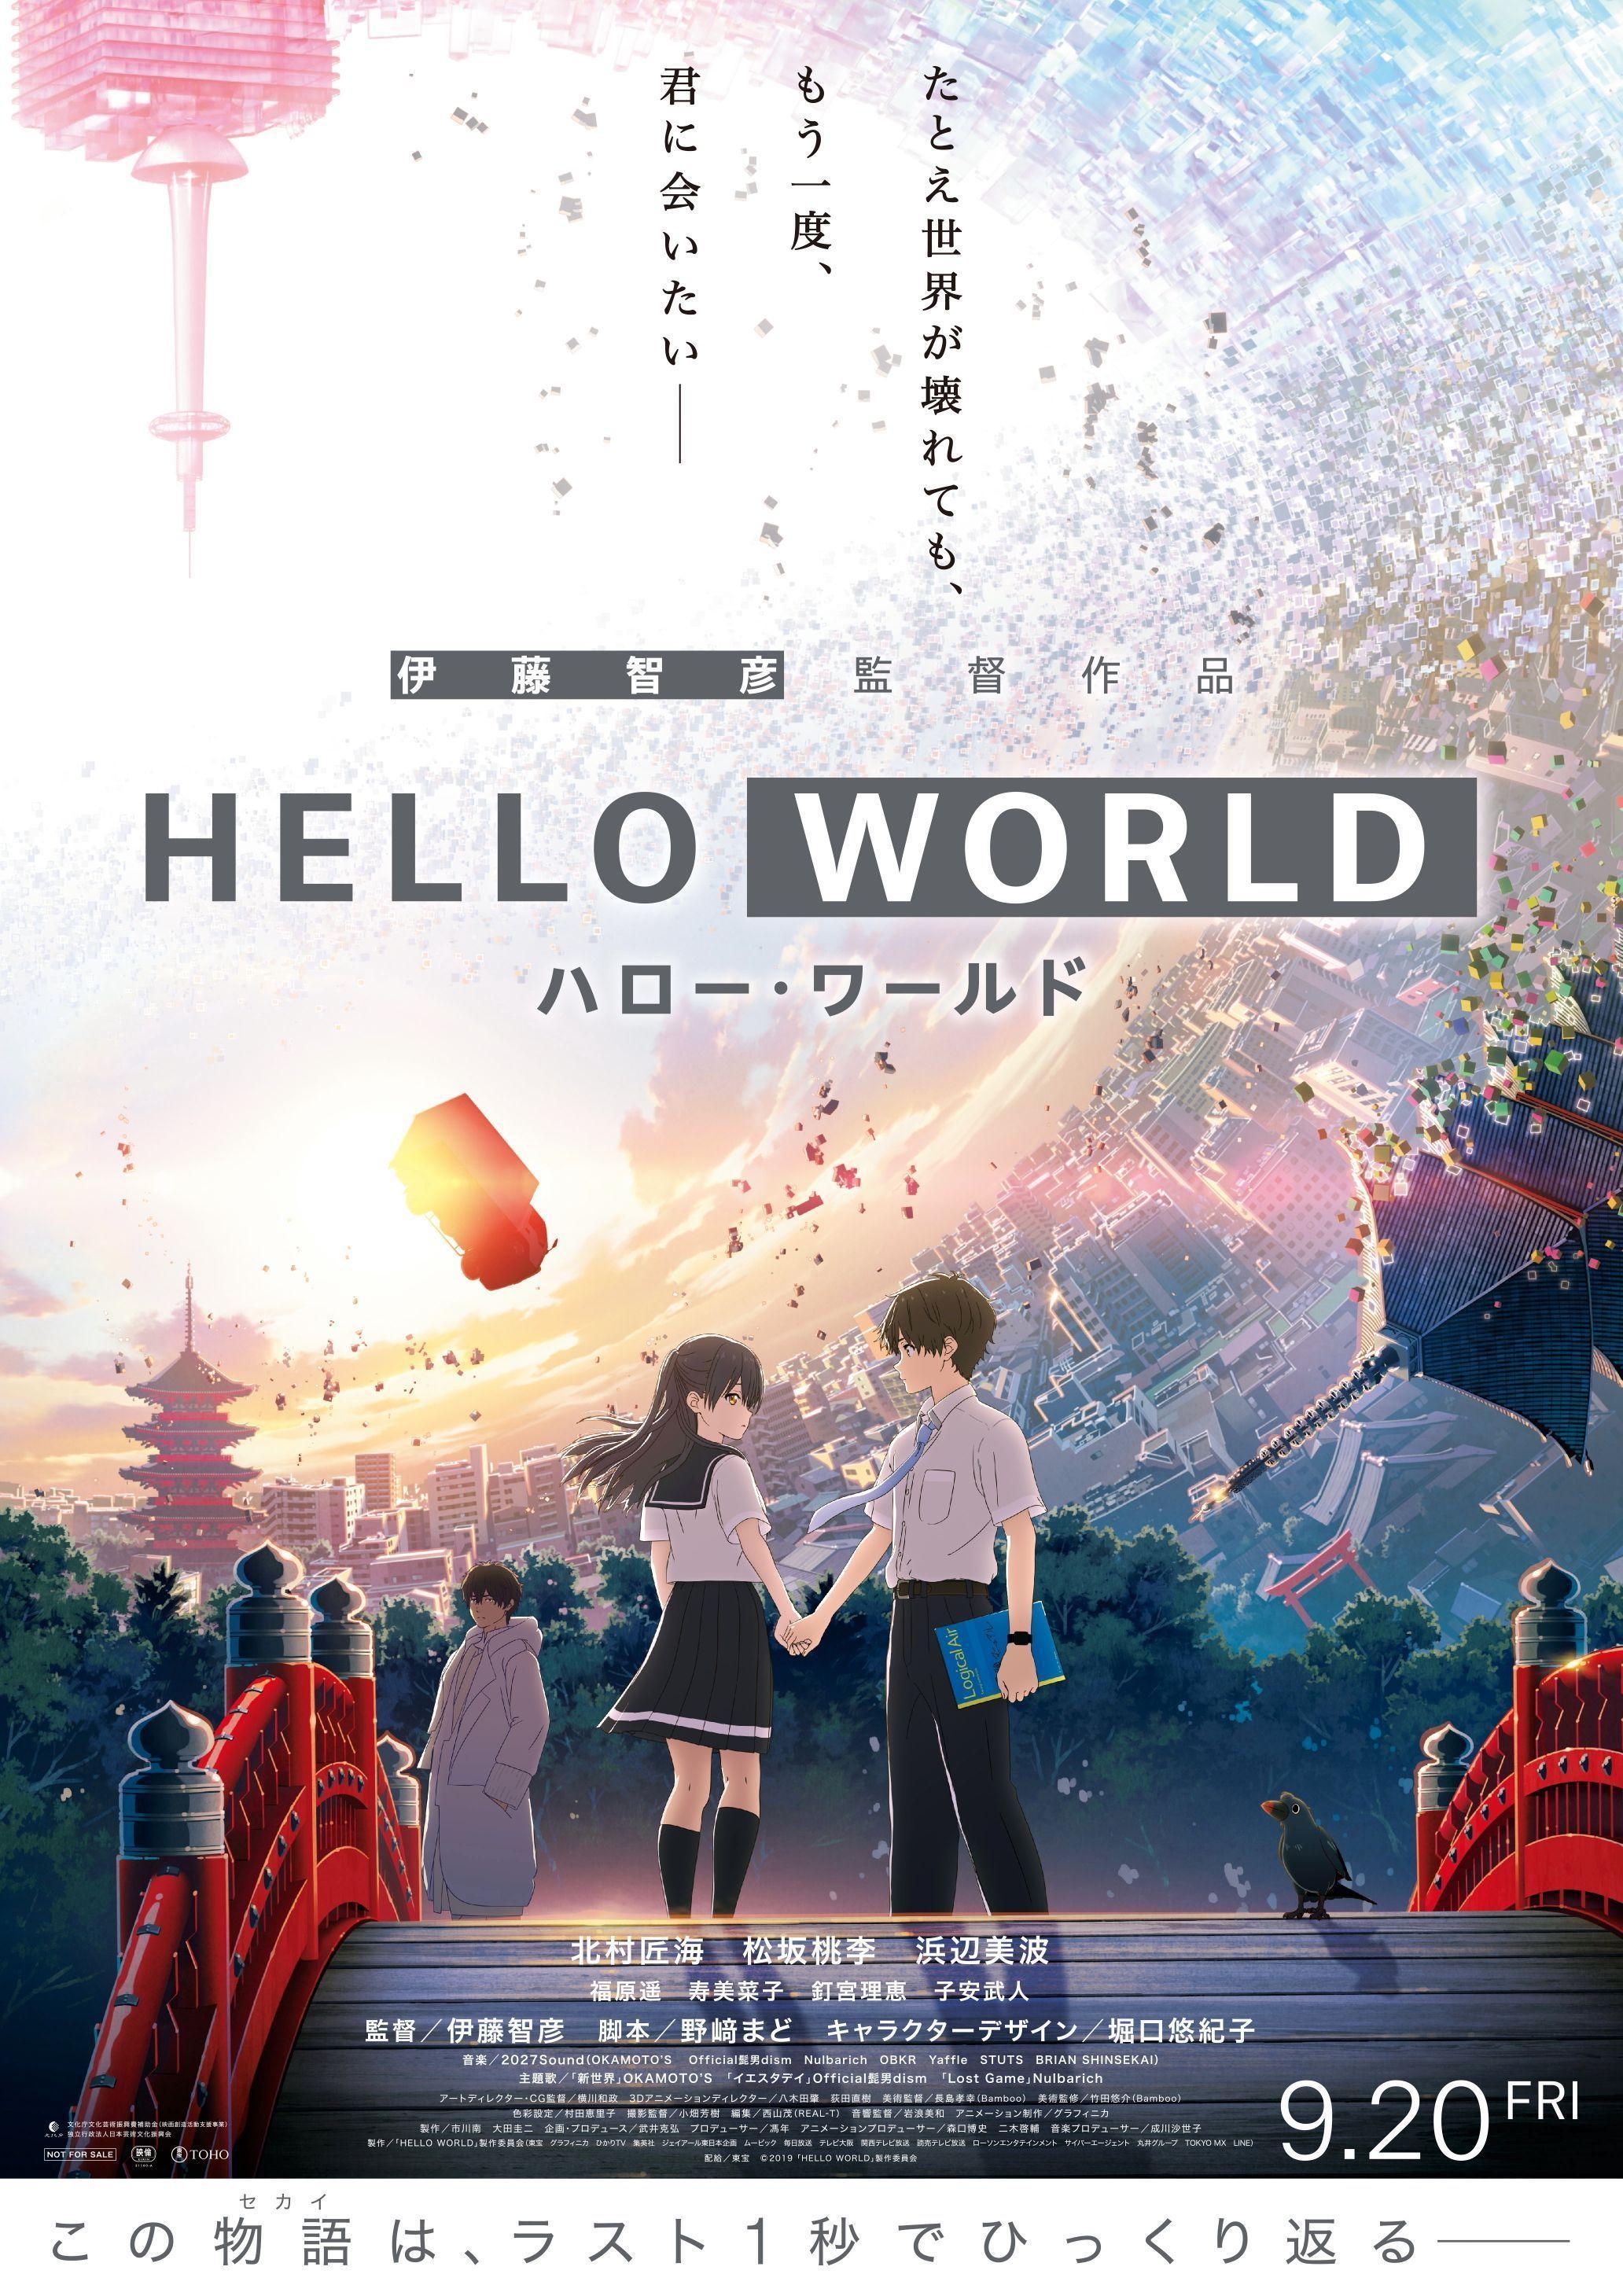 【动画电影】HELLO WORLD /你好世界(中日字幕)【BDrip1080P DTSHD 5.1】【8.8G】